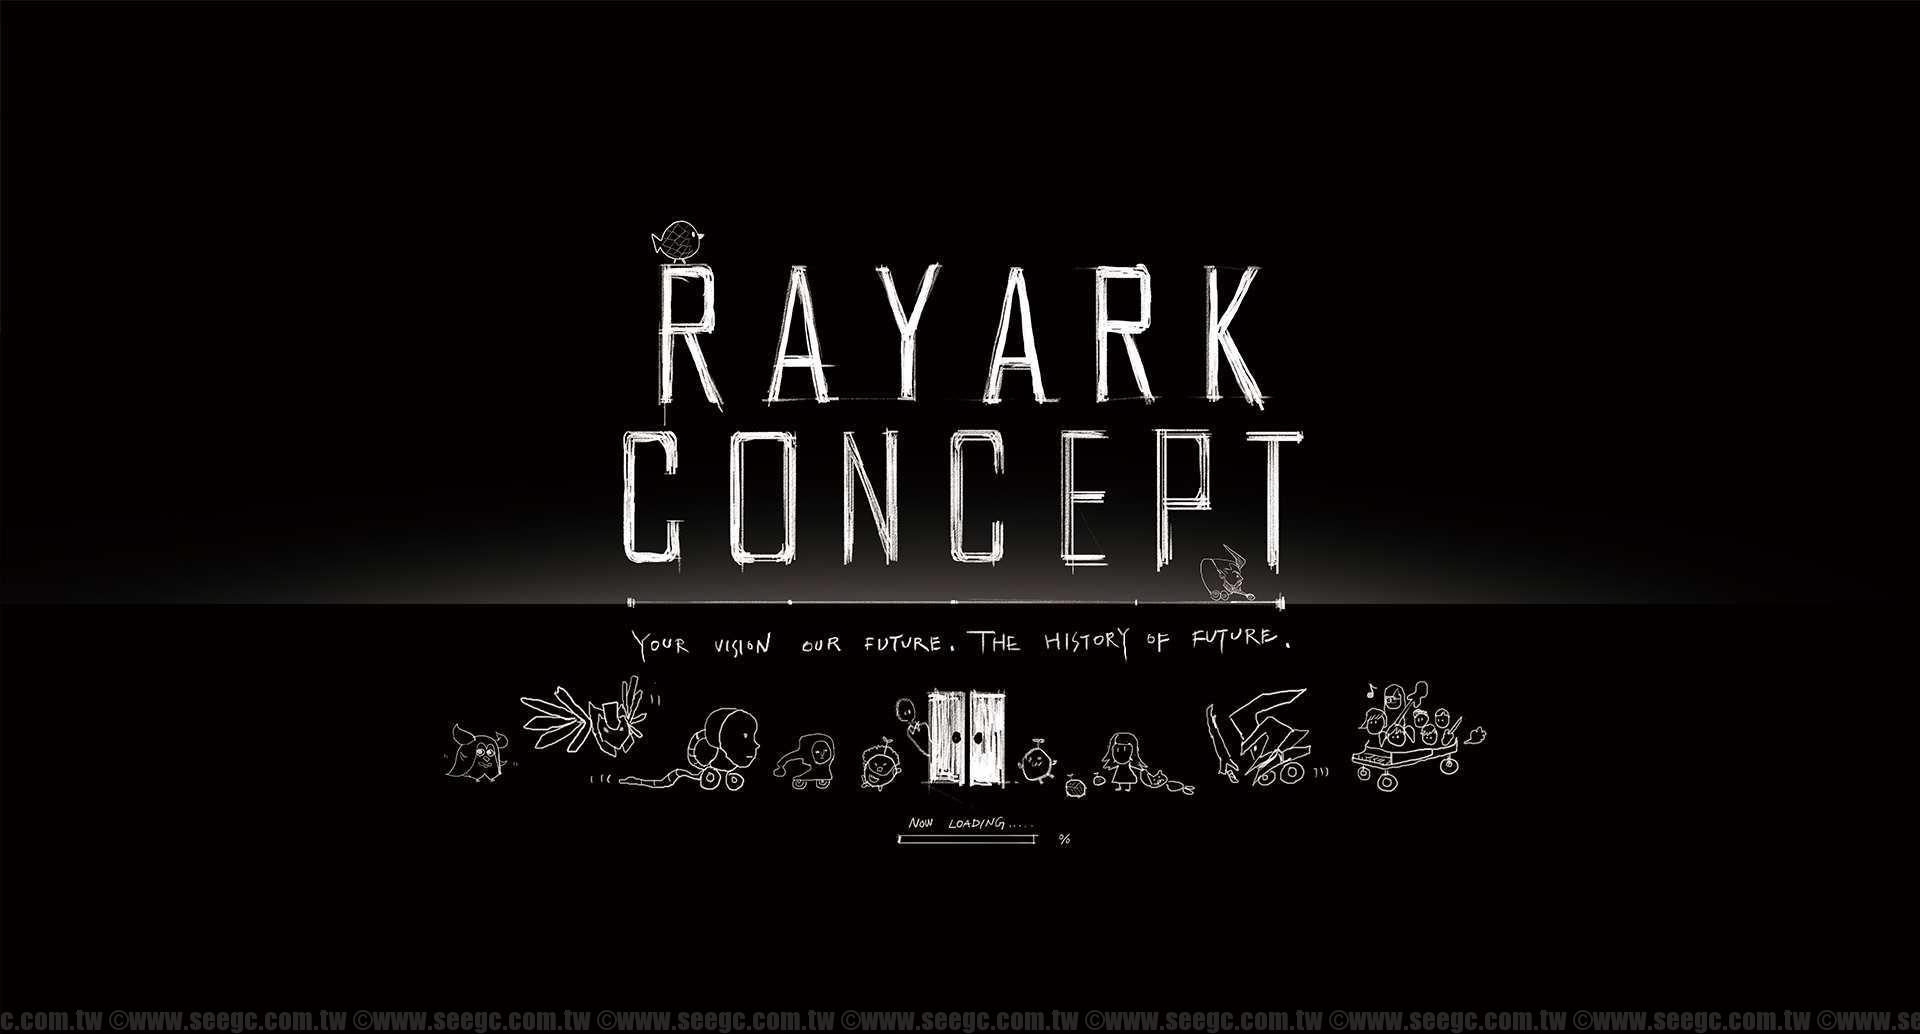 Rayark concept